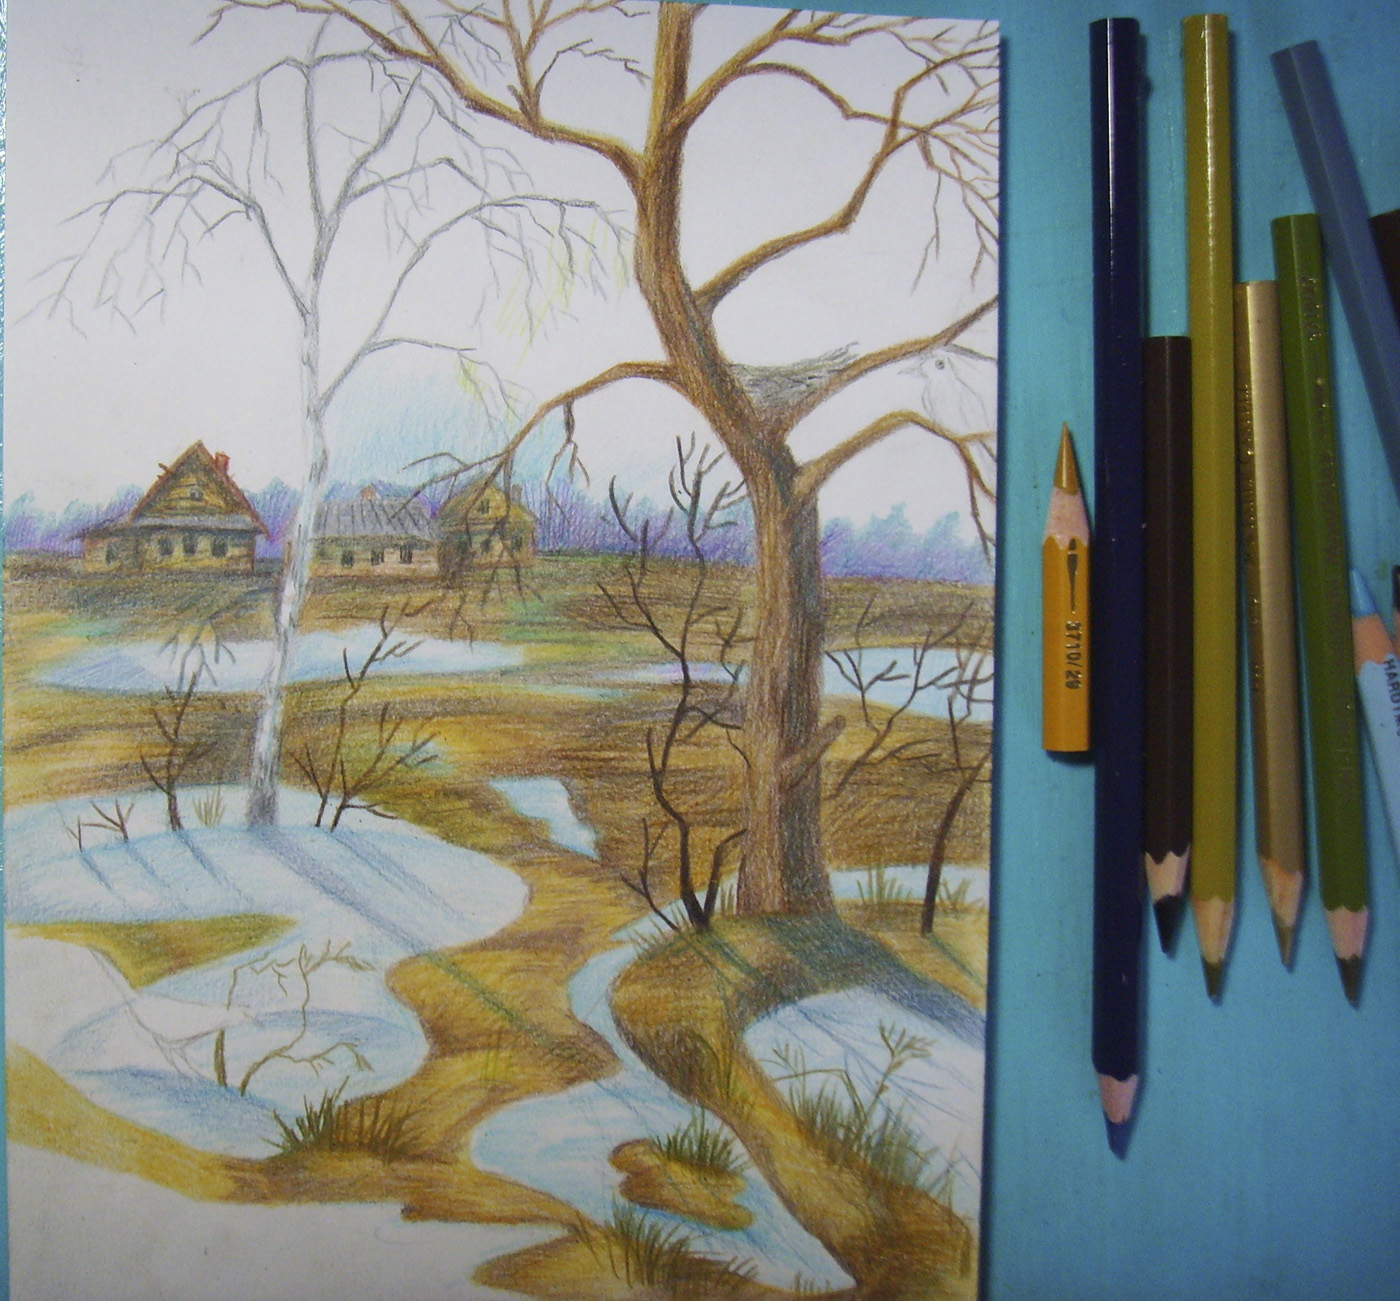 схема рисования пейзажа зимой для ребенка